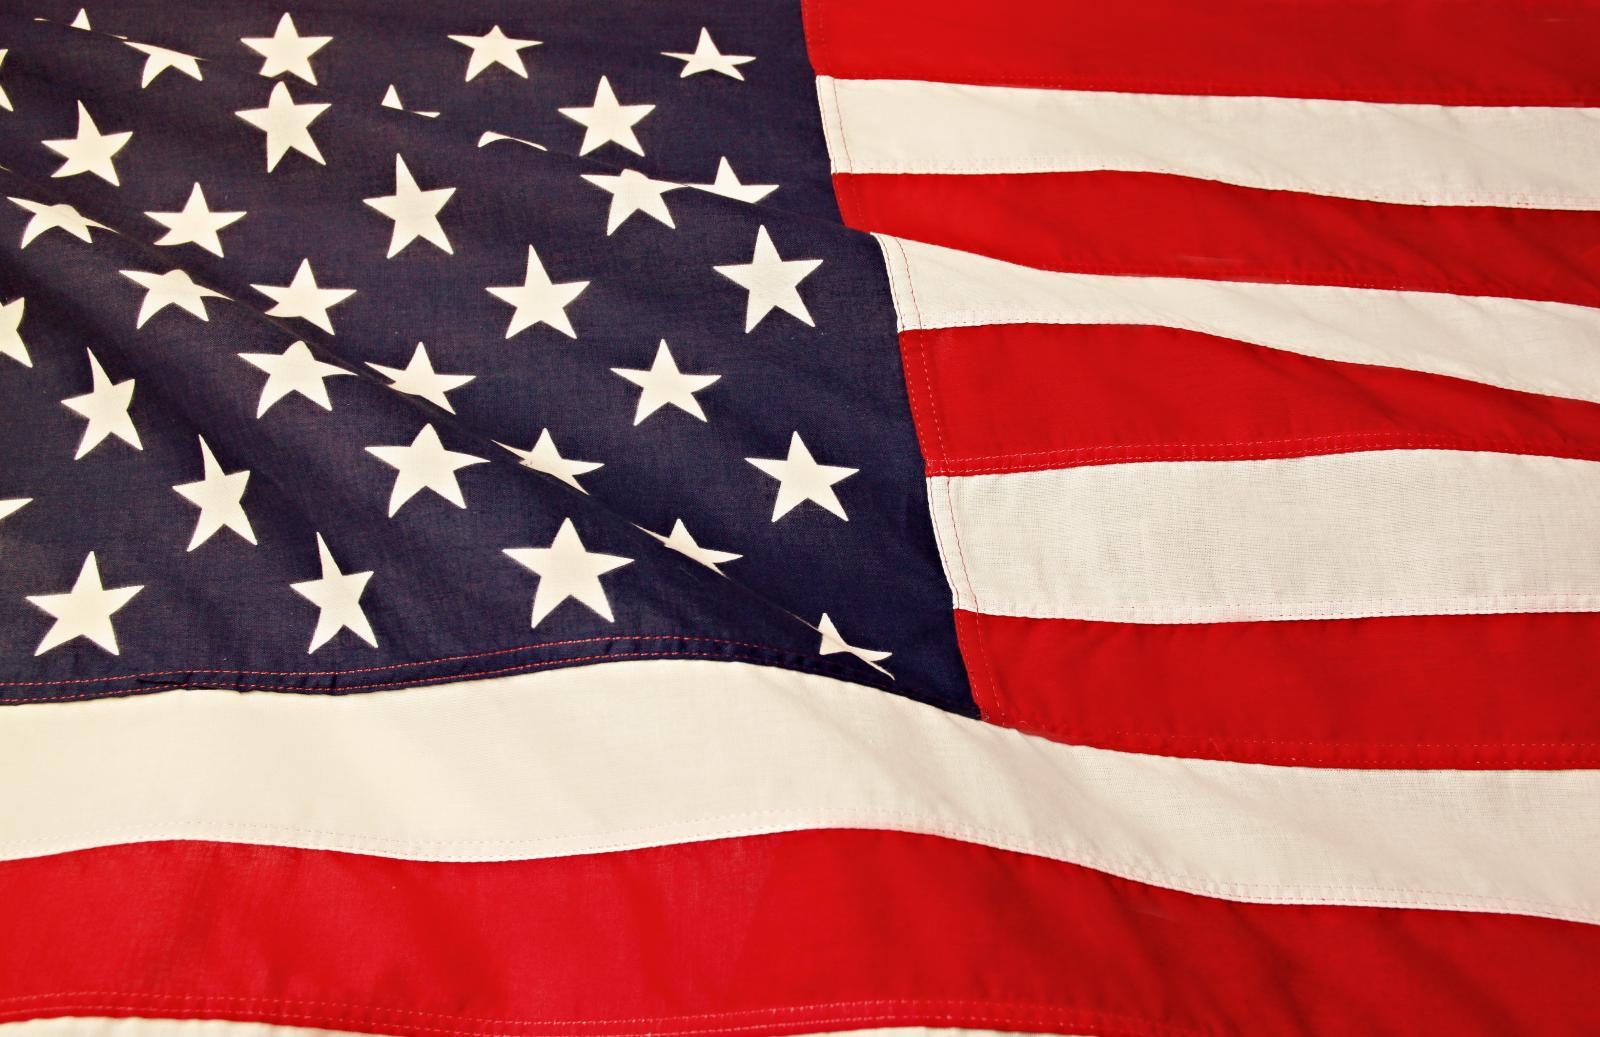 USA Flag. Photo credit: Pexels